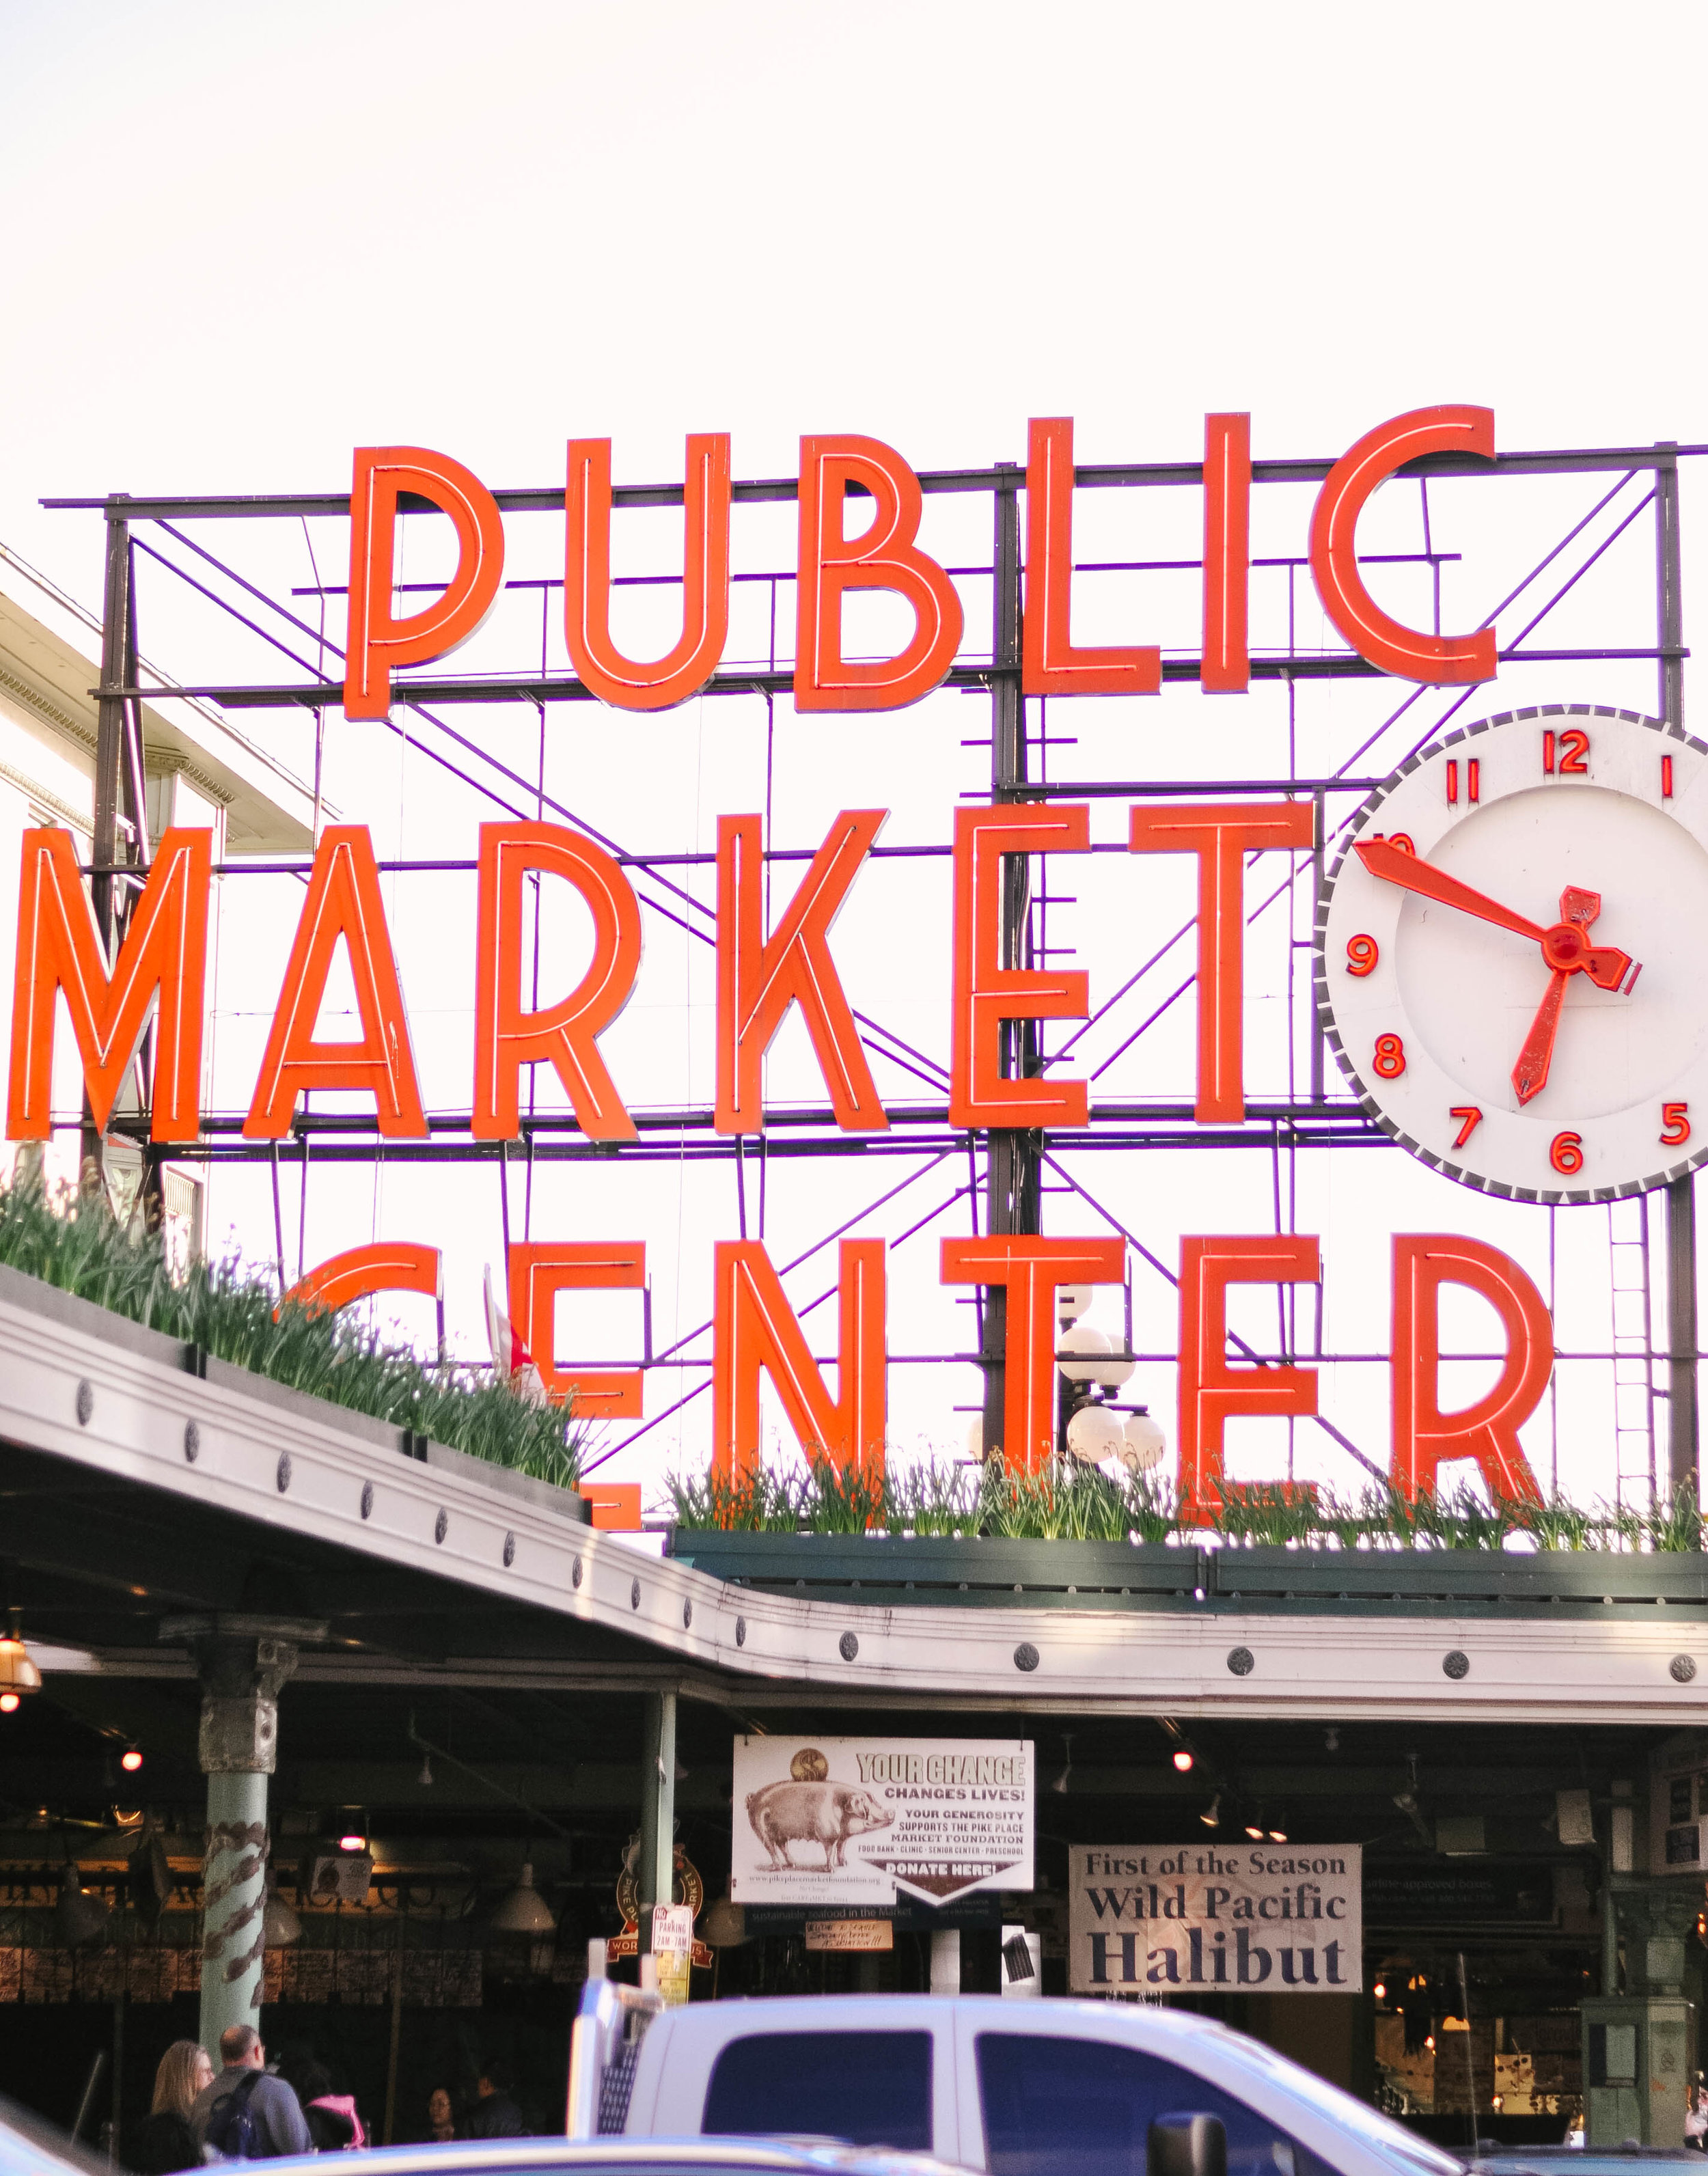 Seattle Washington red public market center sign